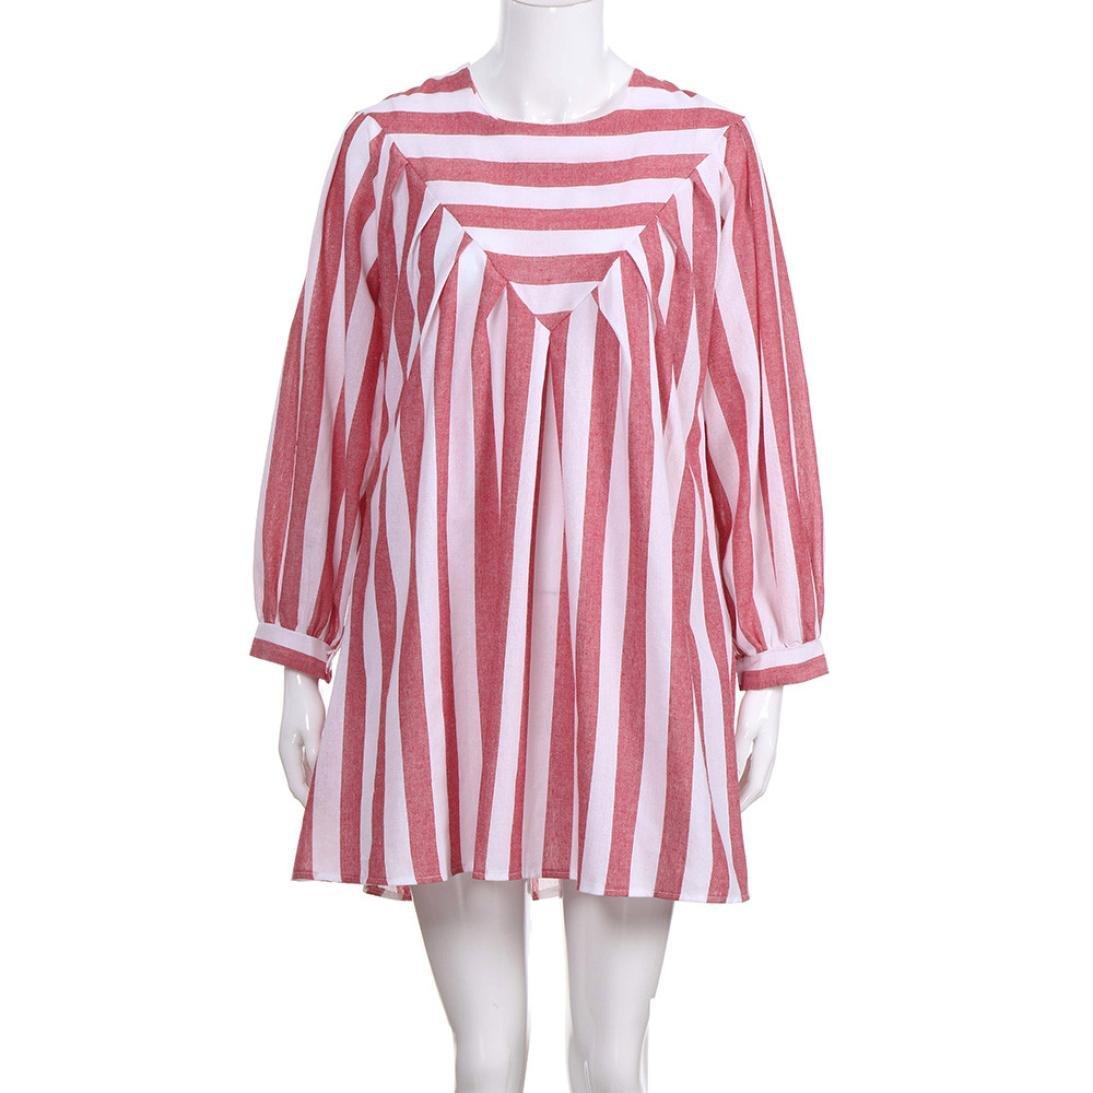 aliveGOT Women's Striped Print Cotton Linen Dress Party Short Beach Mini Dress (Pink, L)